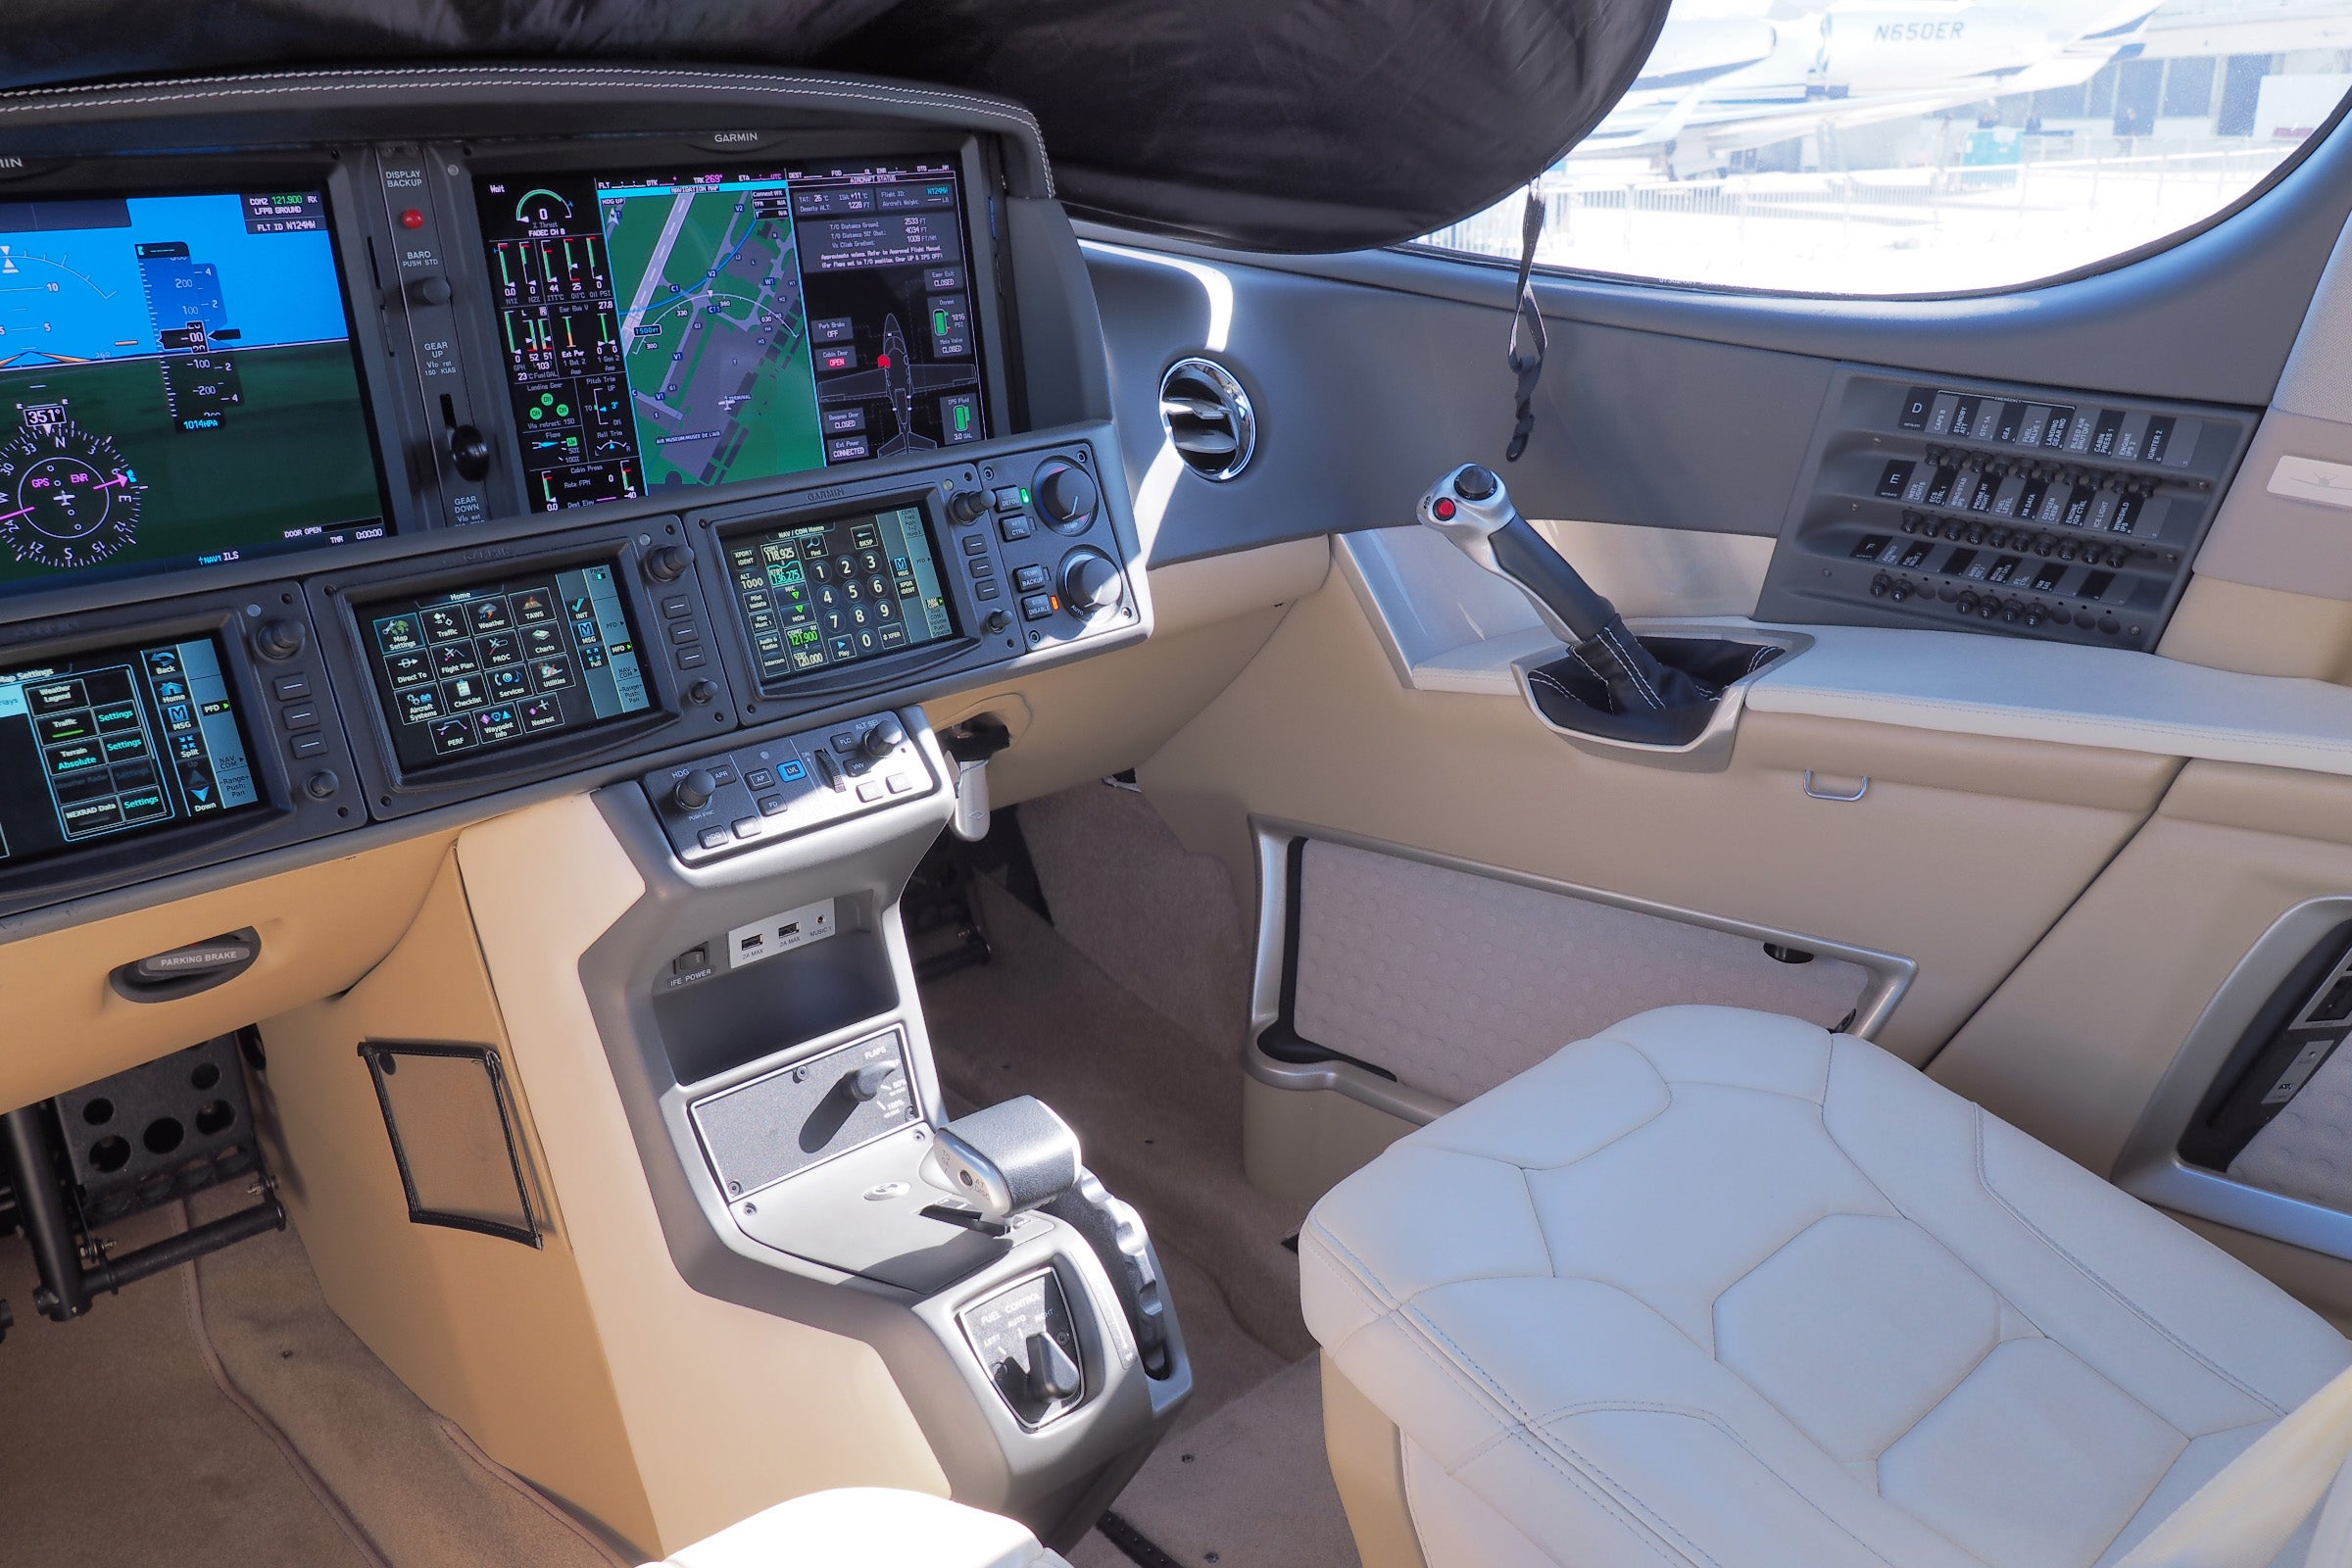 Vision Jet controls